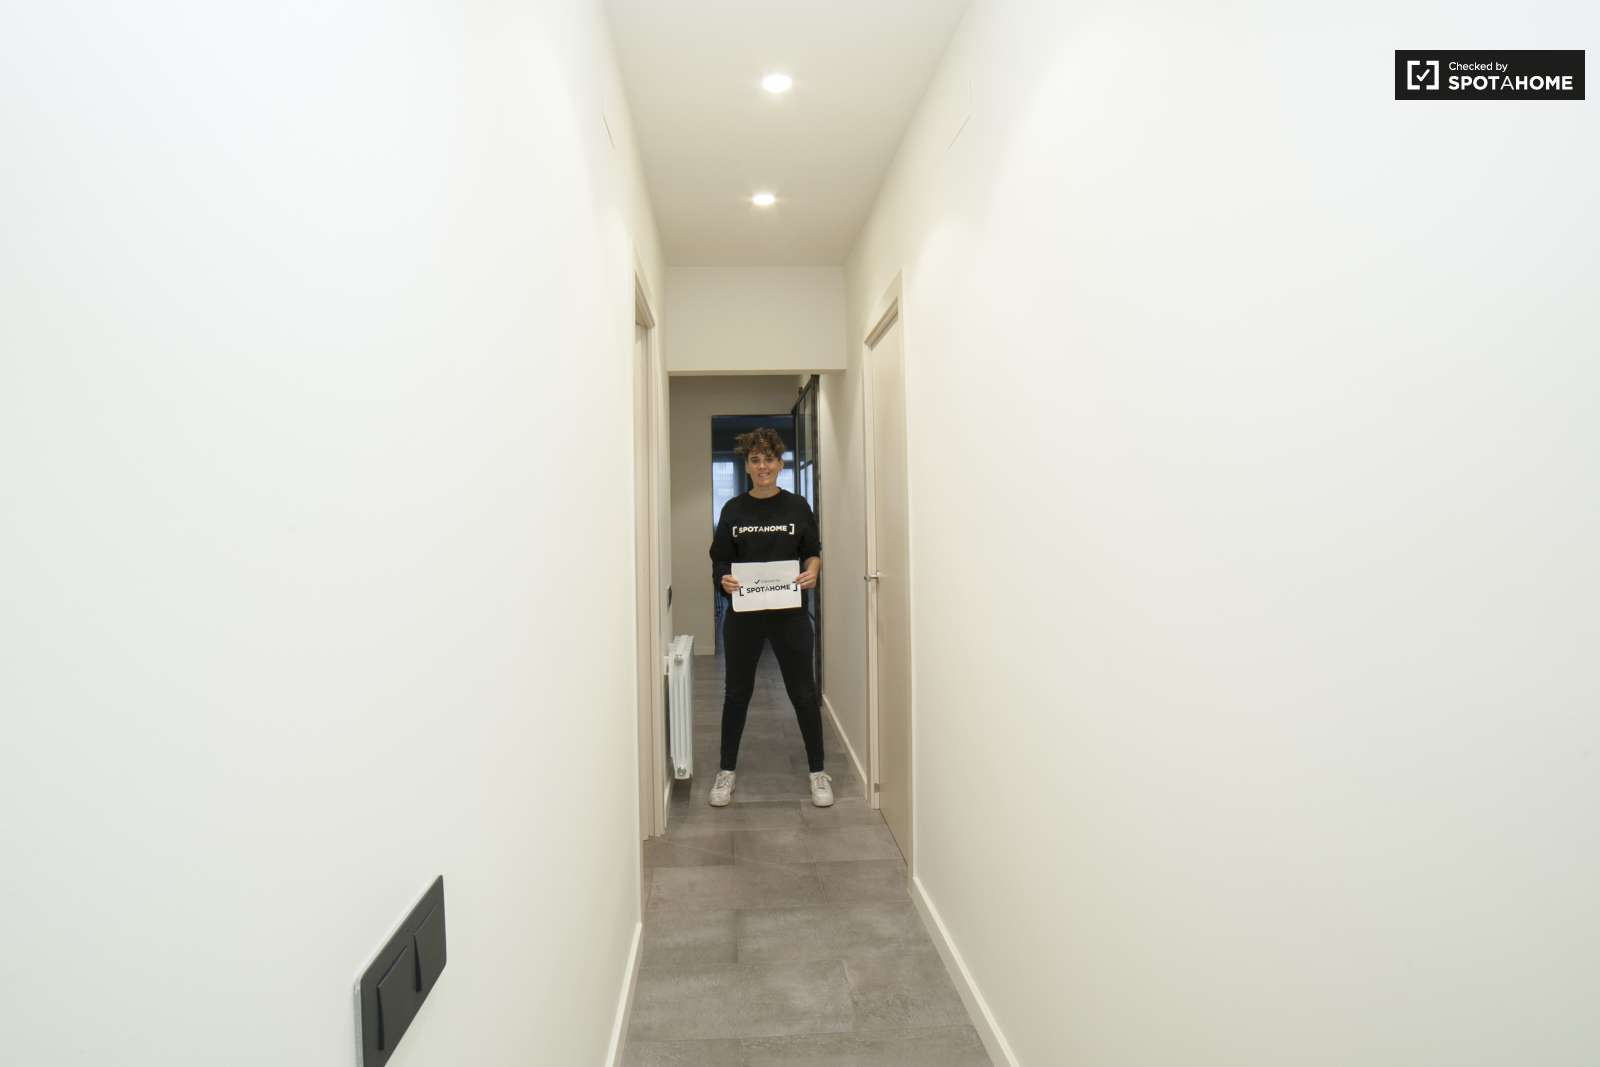 Spacious 1-bedroom apartment for rent in Sarrià-Sant Gervasi